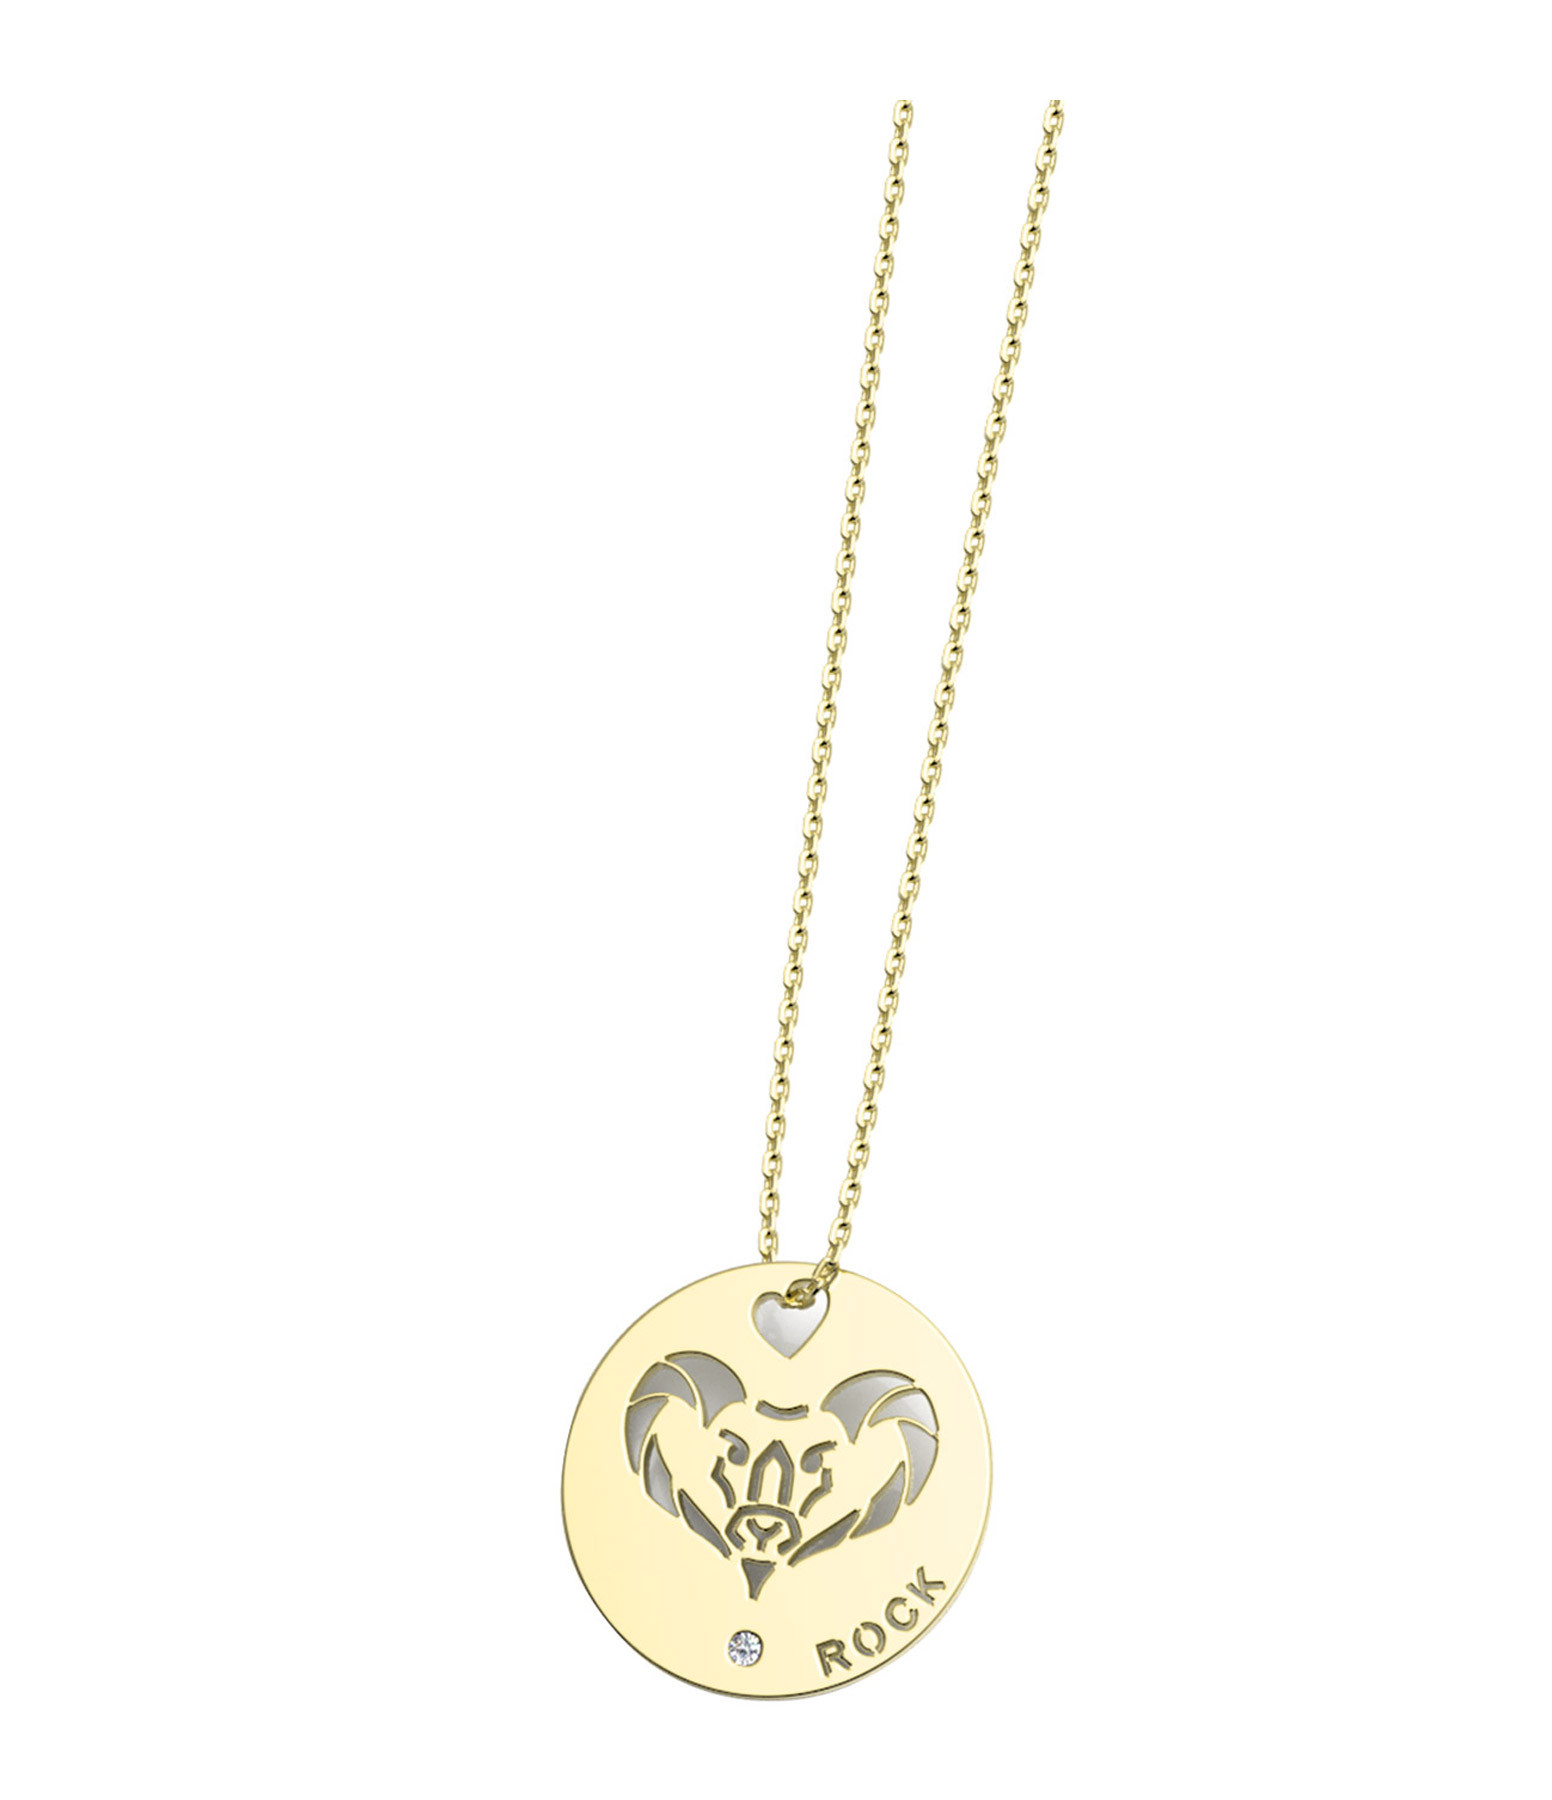 NAVA JOAILLERIE - Collier Horosco-Rock Capricorne Diamants Or